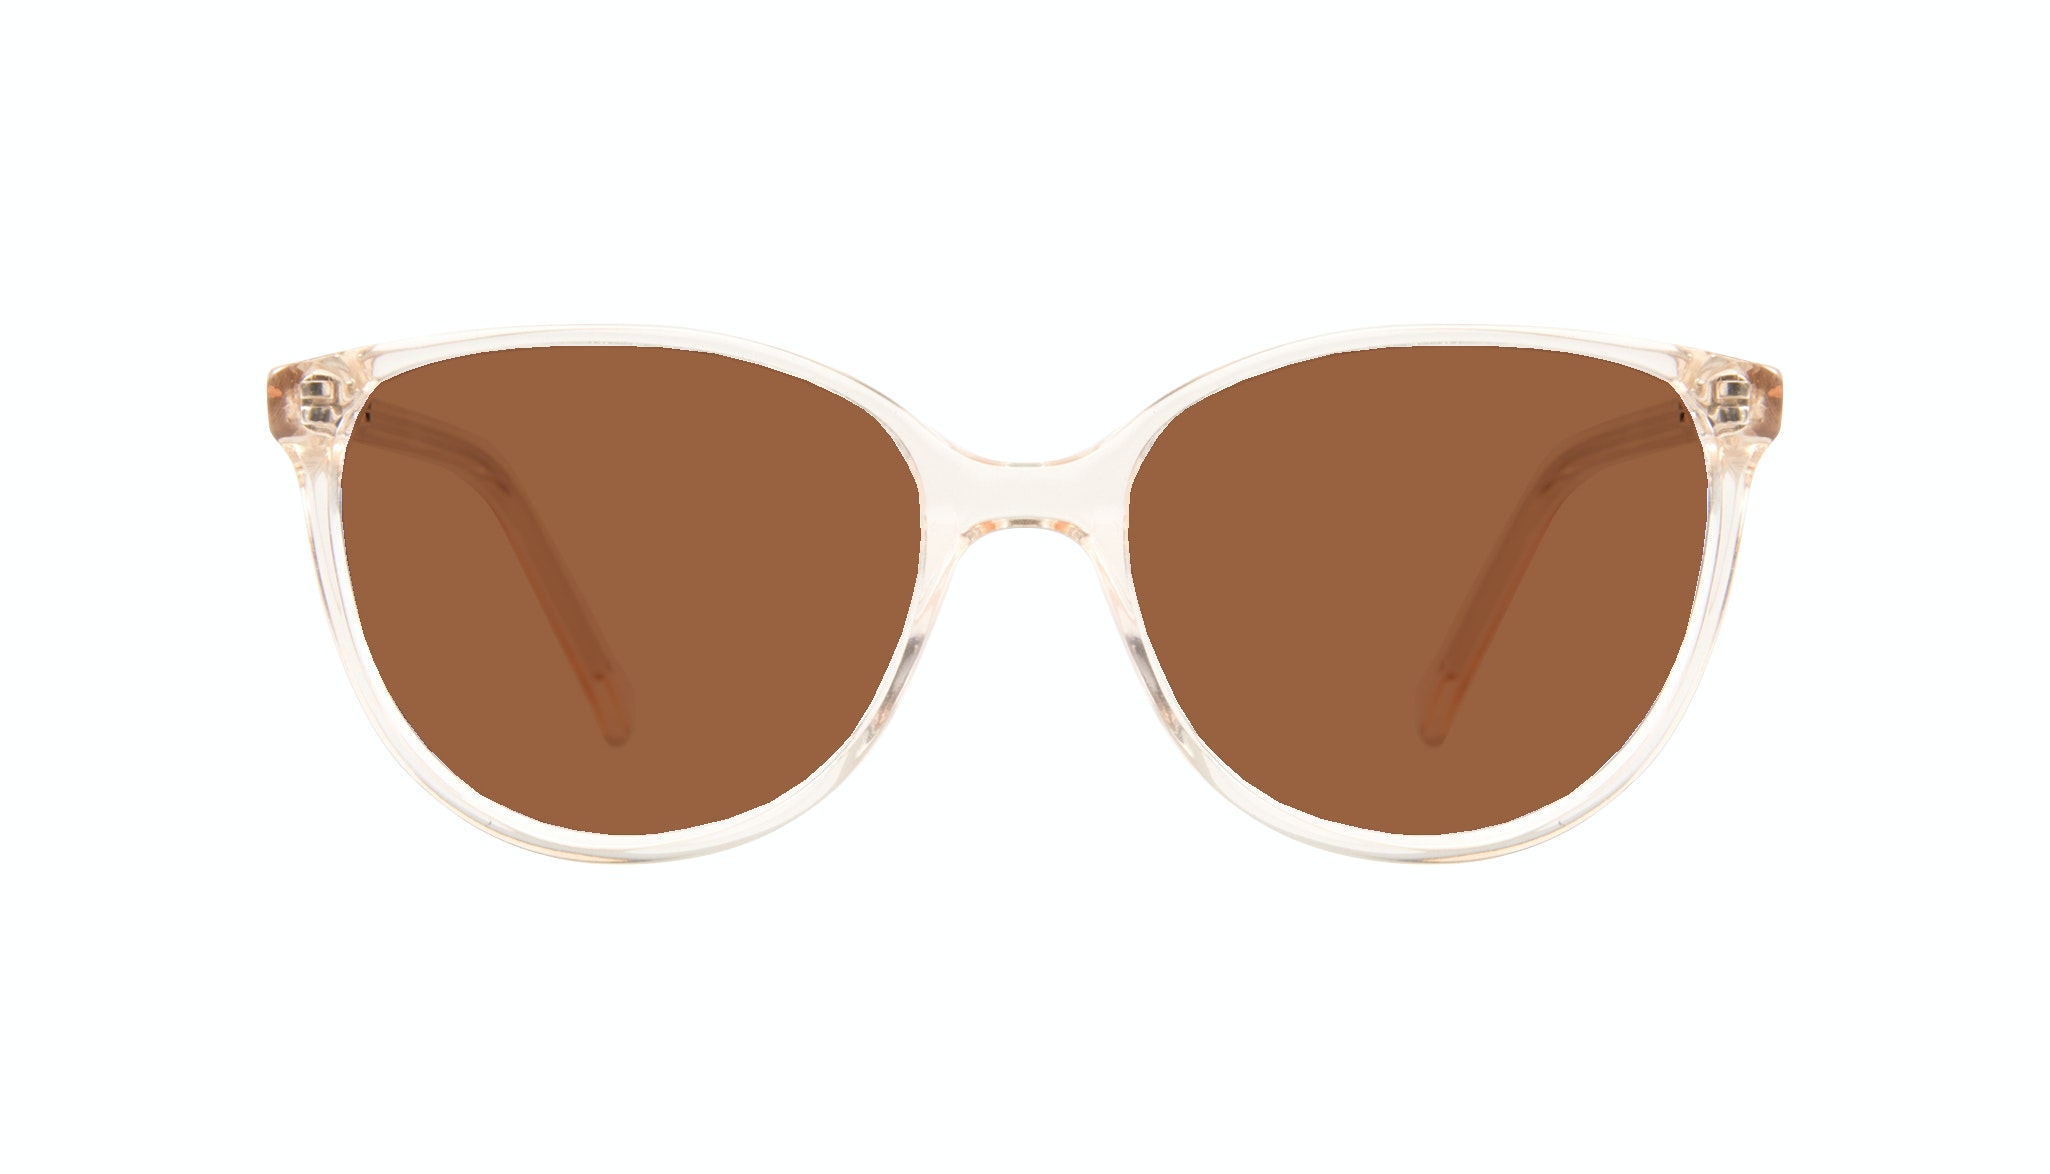 Affordable Fashion Glasses Round Sunglasses Women Imagine Petite Blond